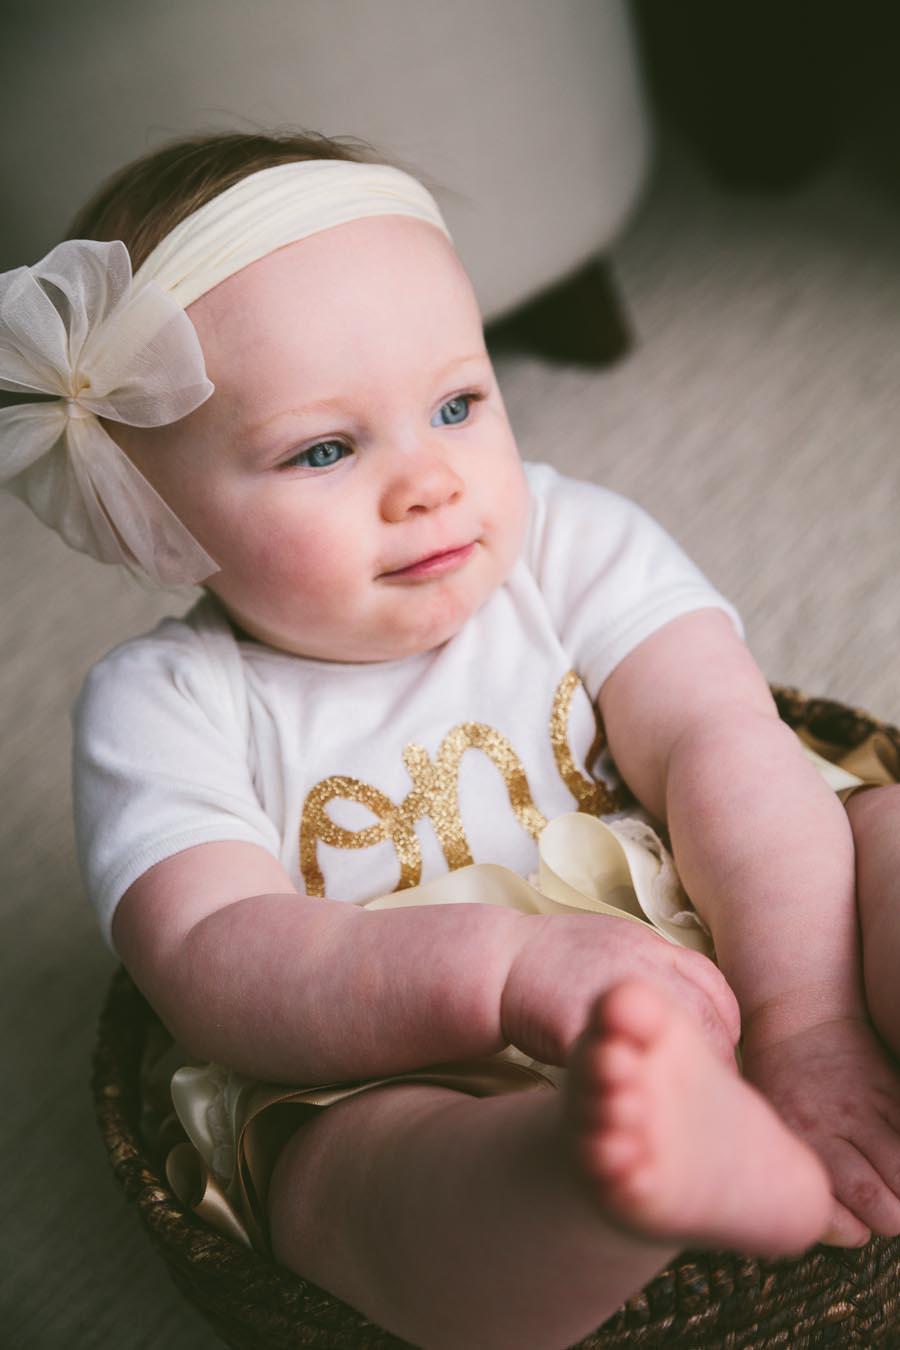 twinsburg-ohio-baby-portraits-photography-josie-13.jpg